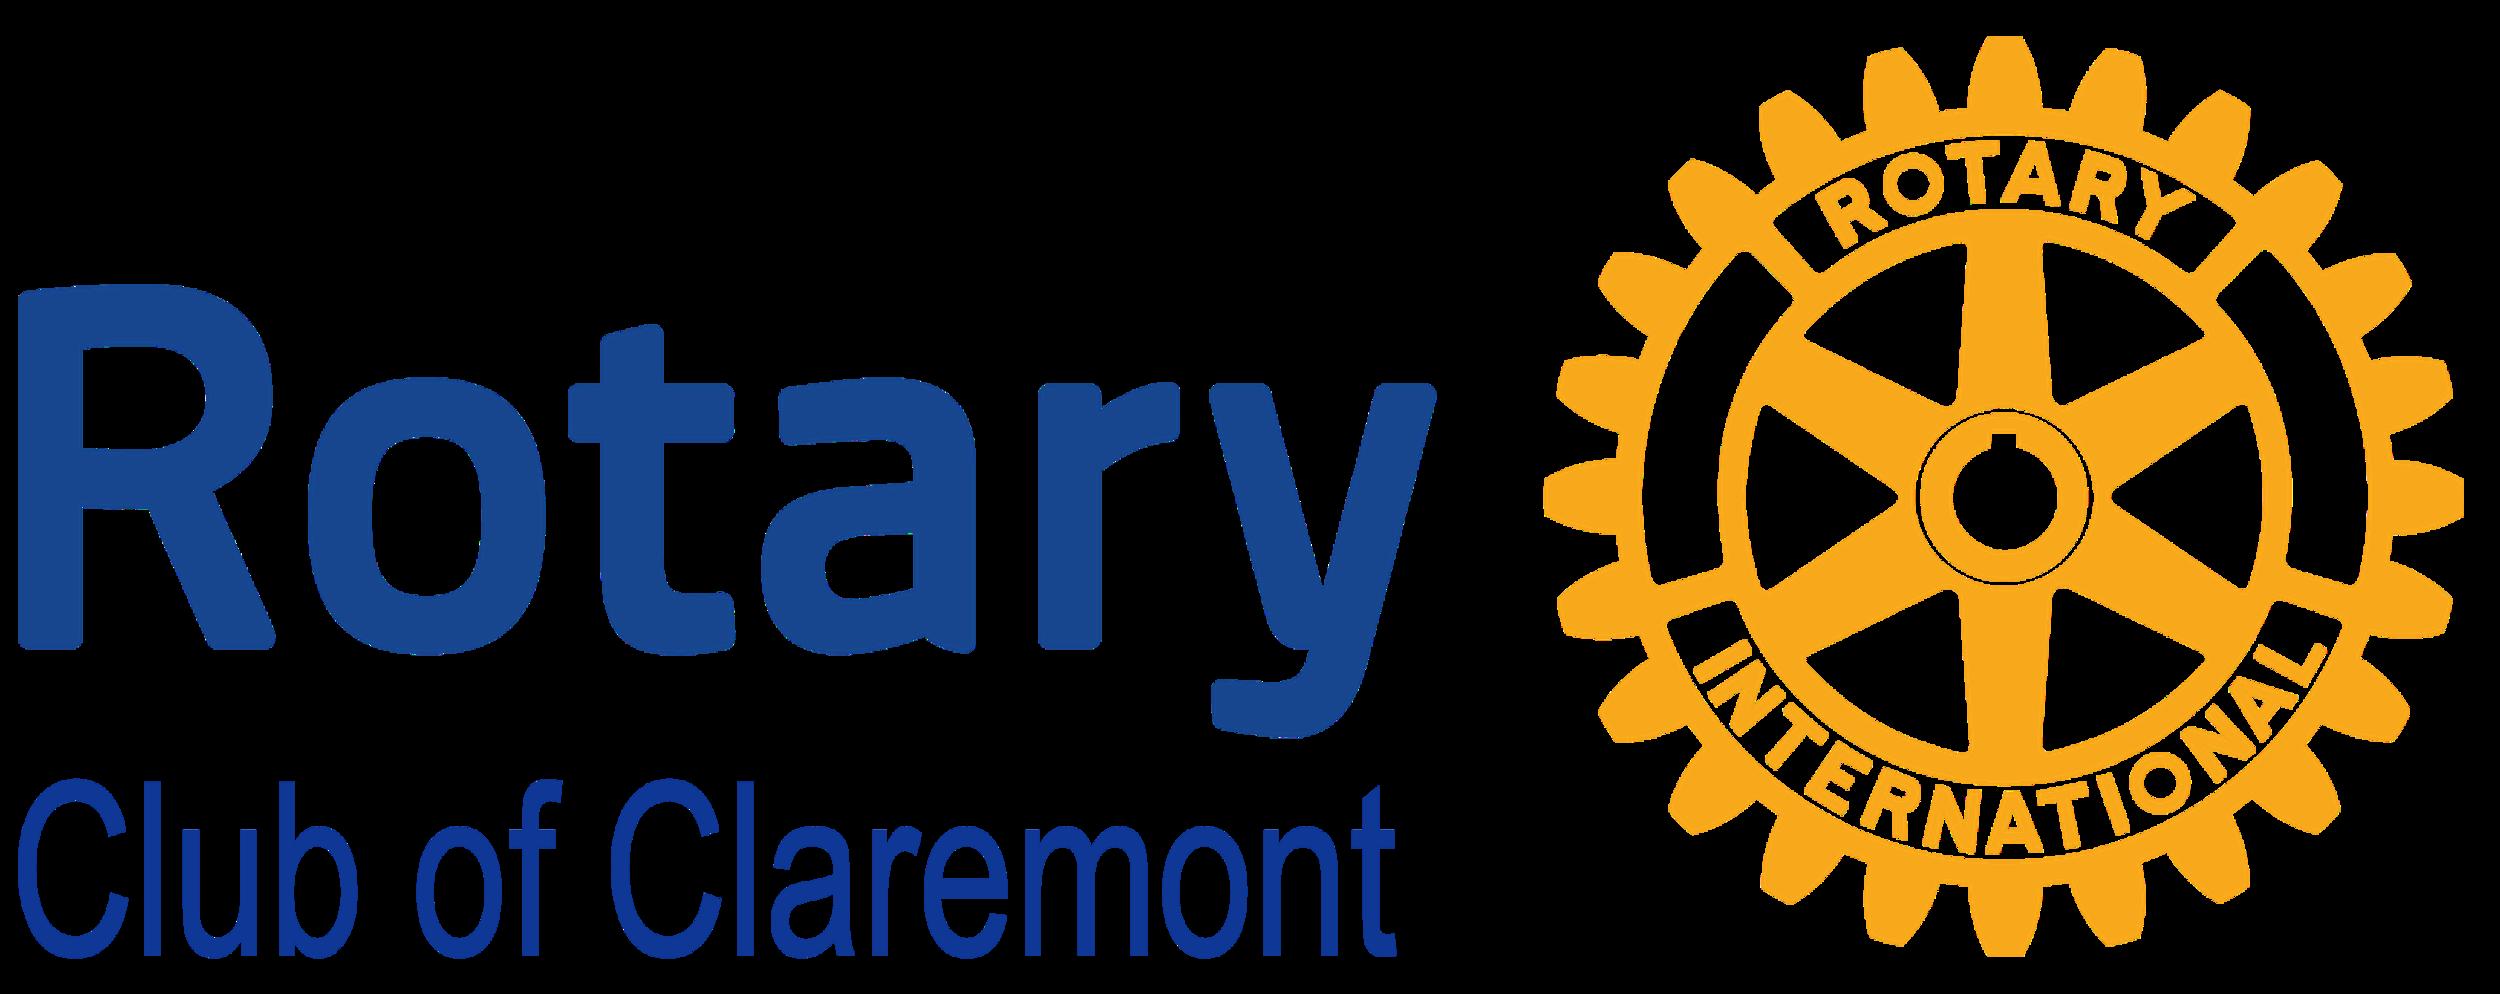 RotaryClubClaremontLogo.png